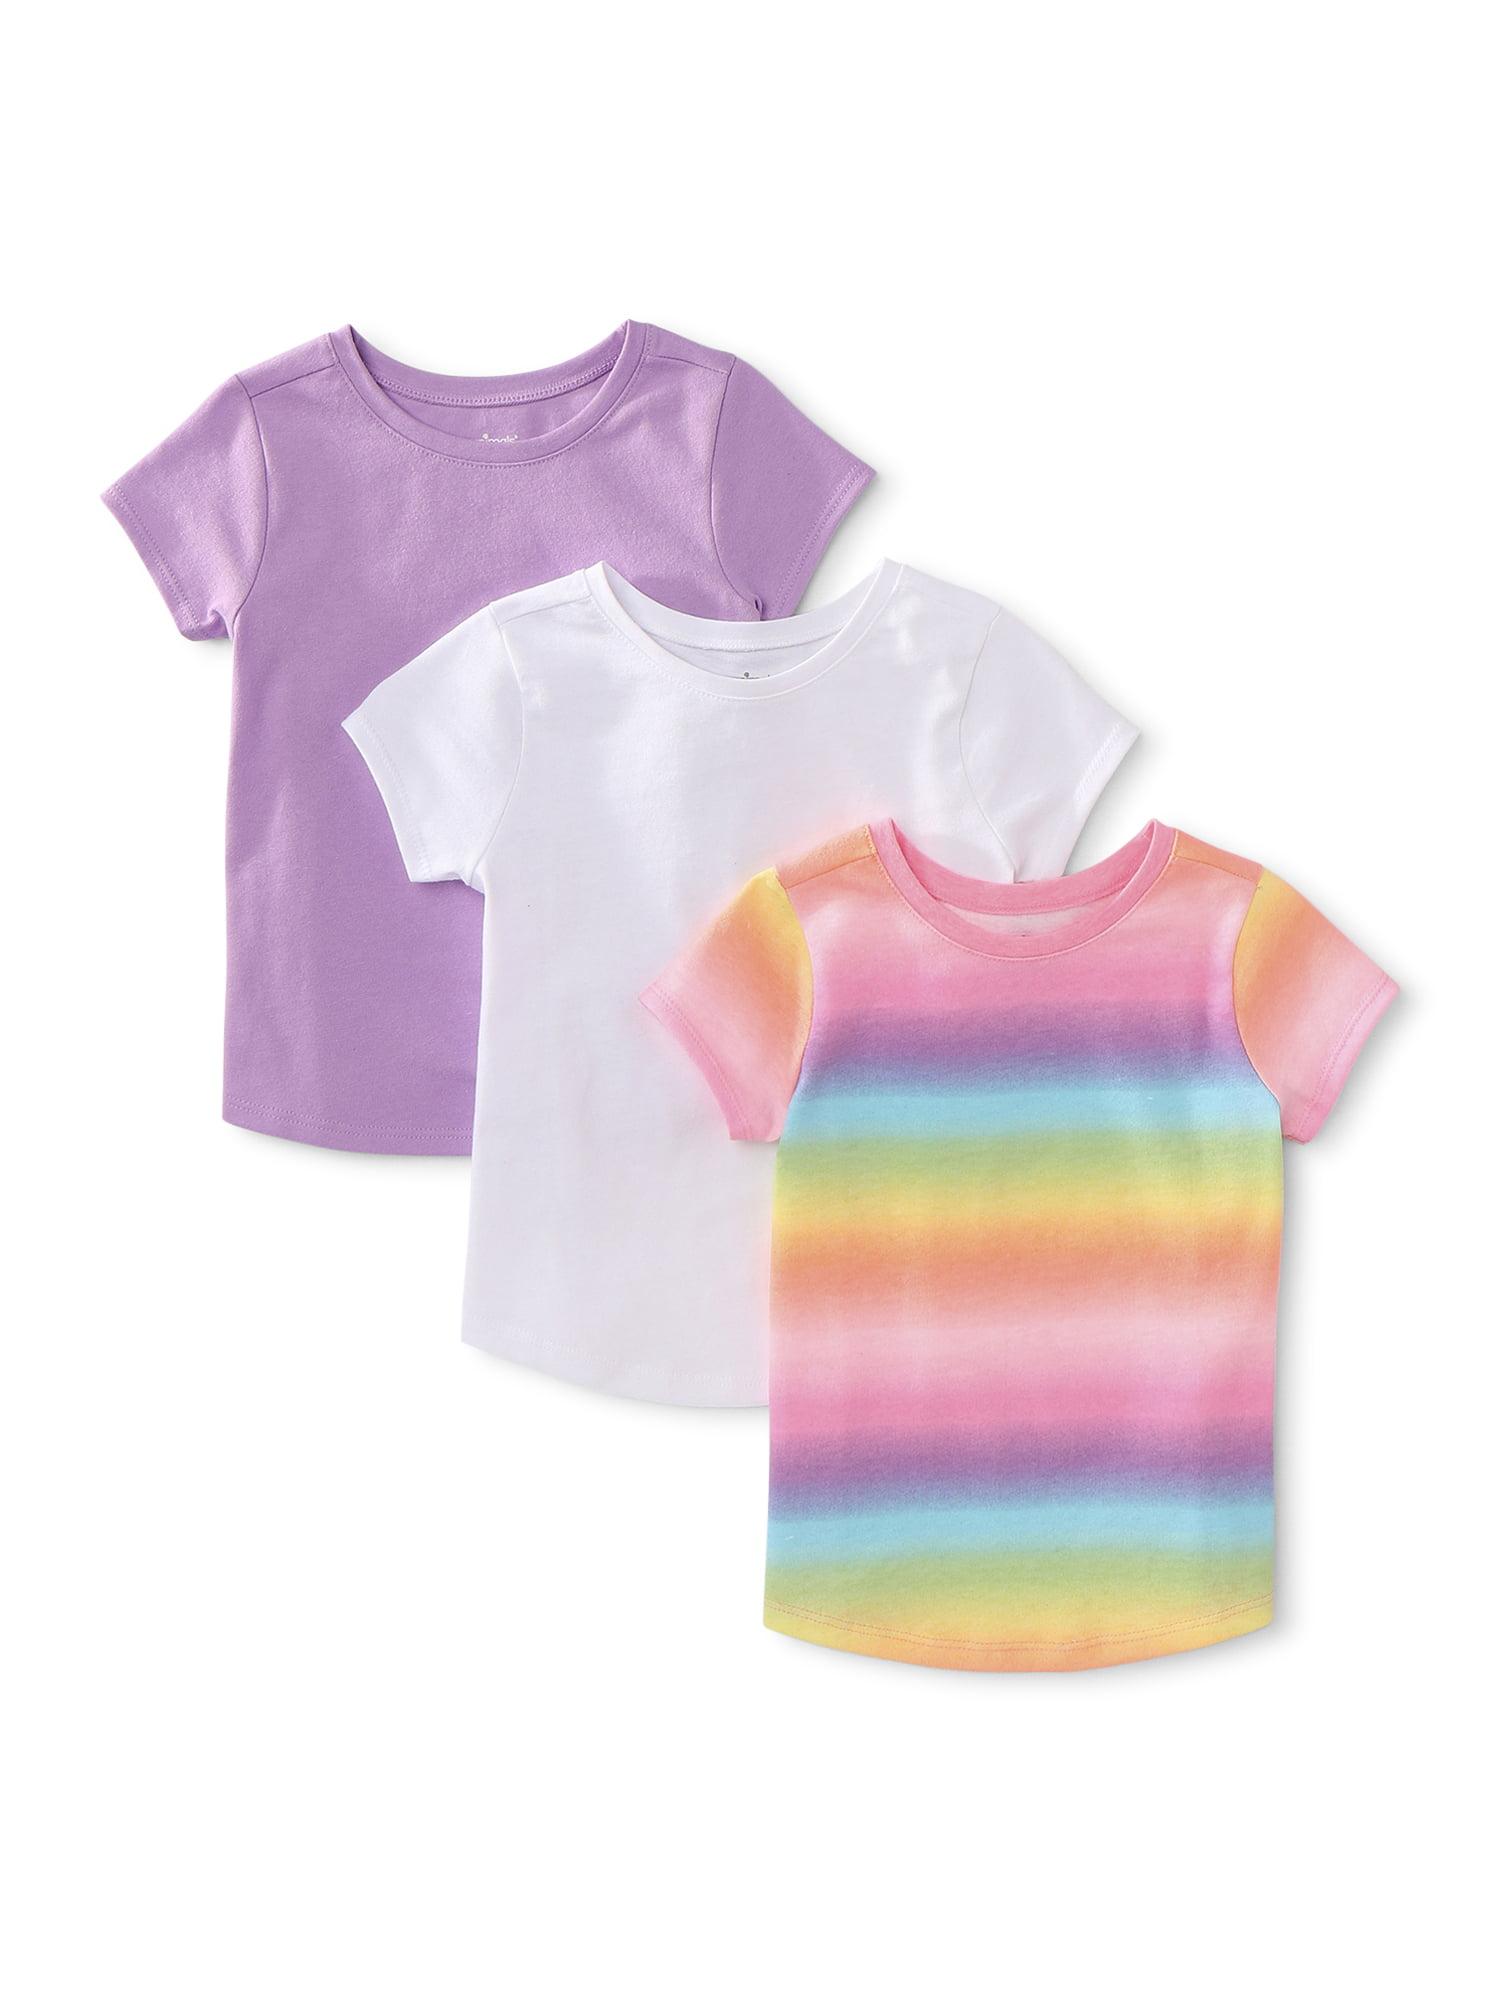 Danskin T-shirt sz 7-8 /& 10-12 Train Hard Teal Orange Pink Girls